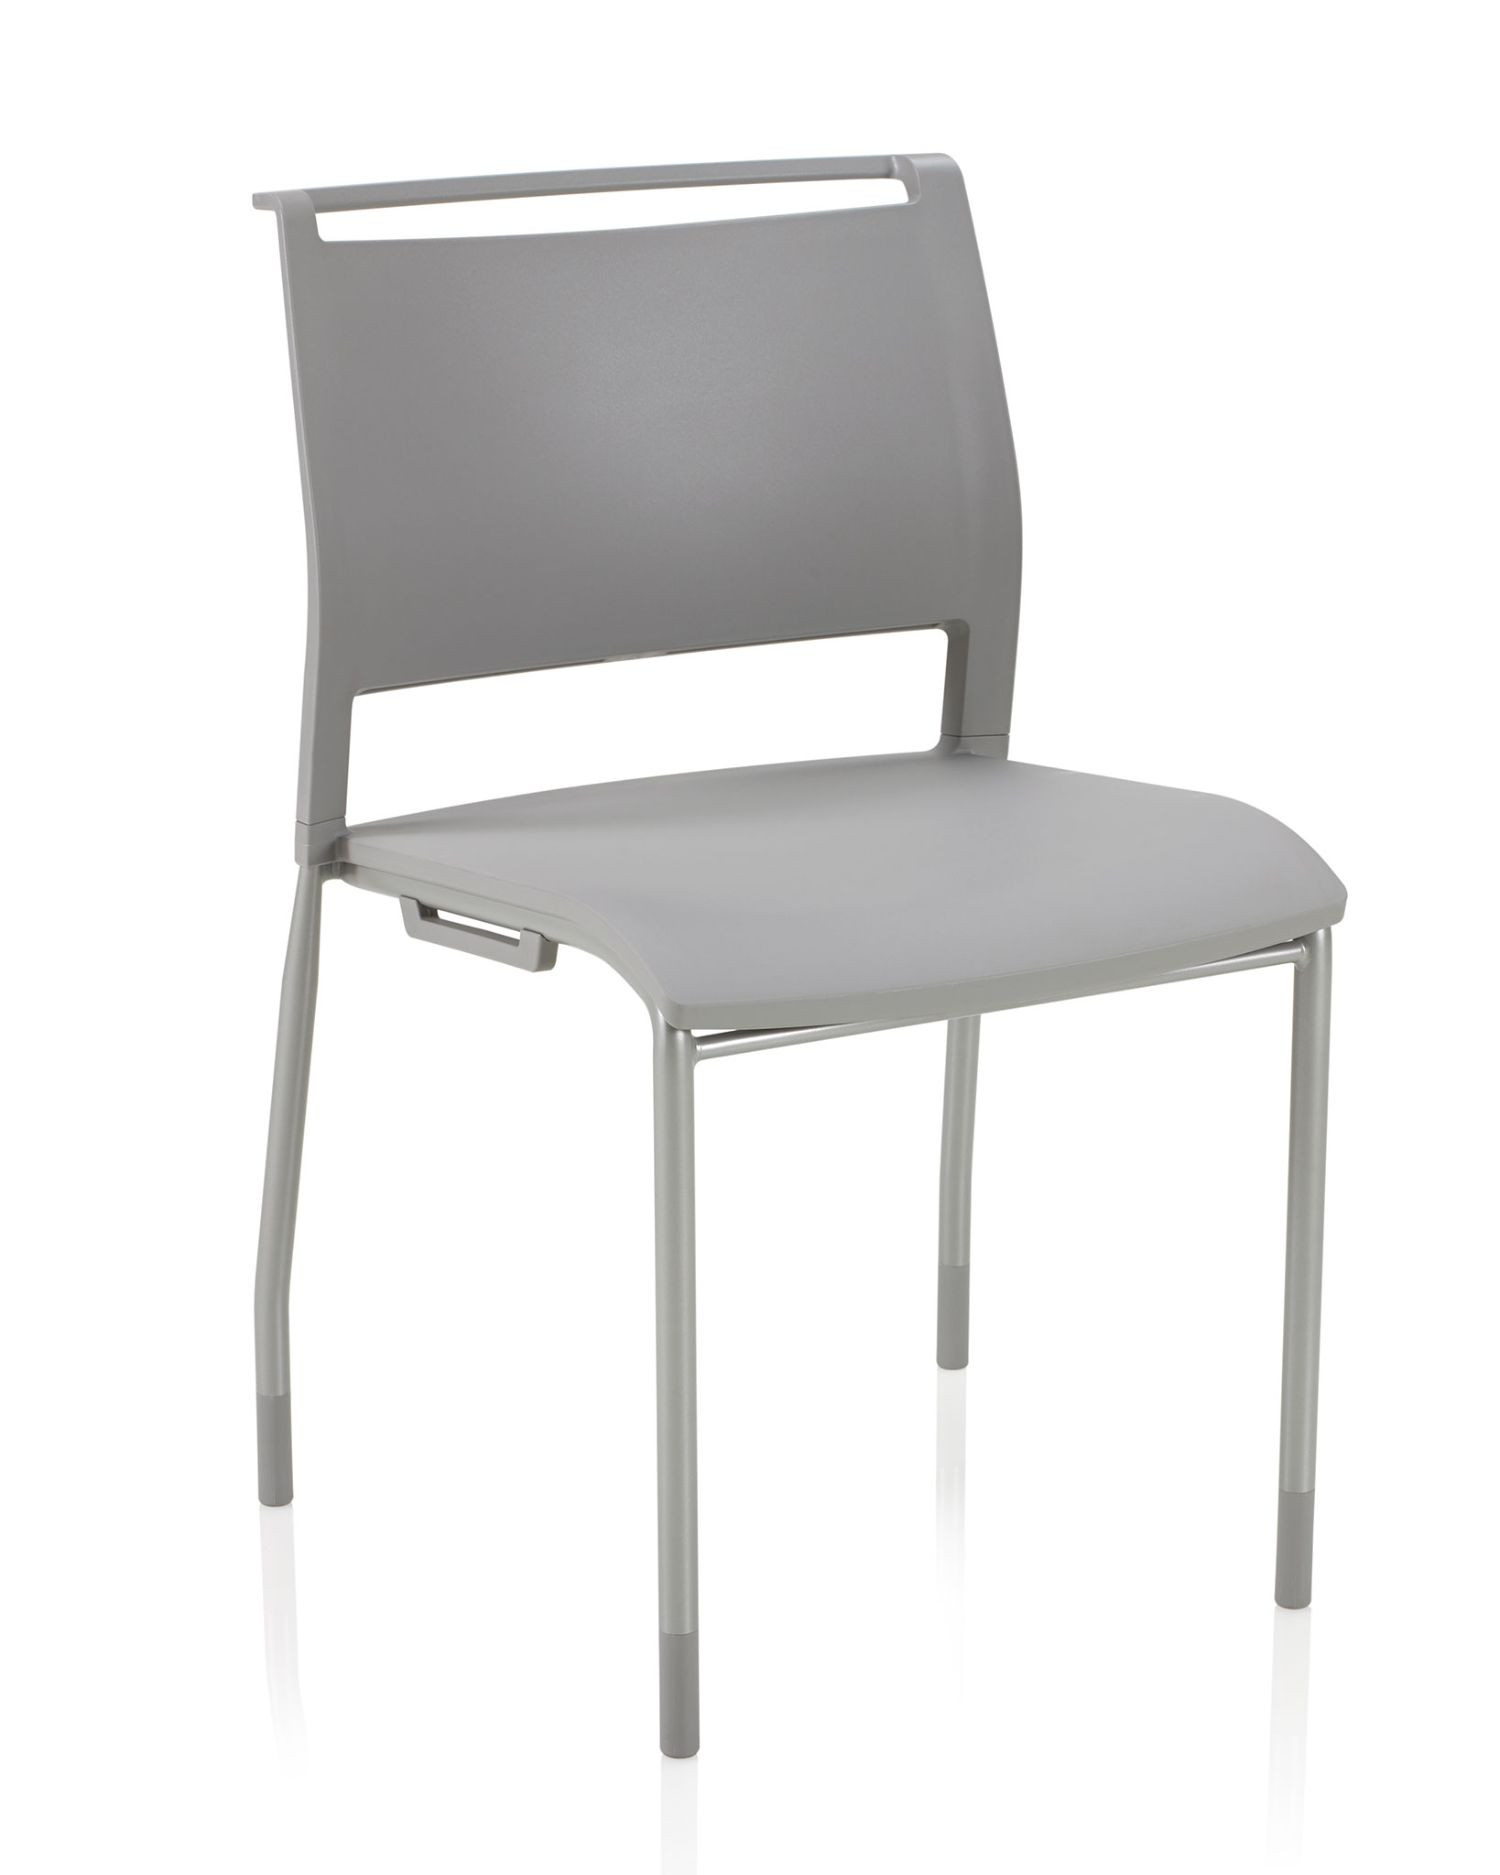 ki opt4 stack chair in stone gray